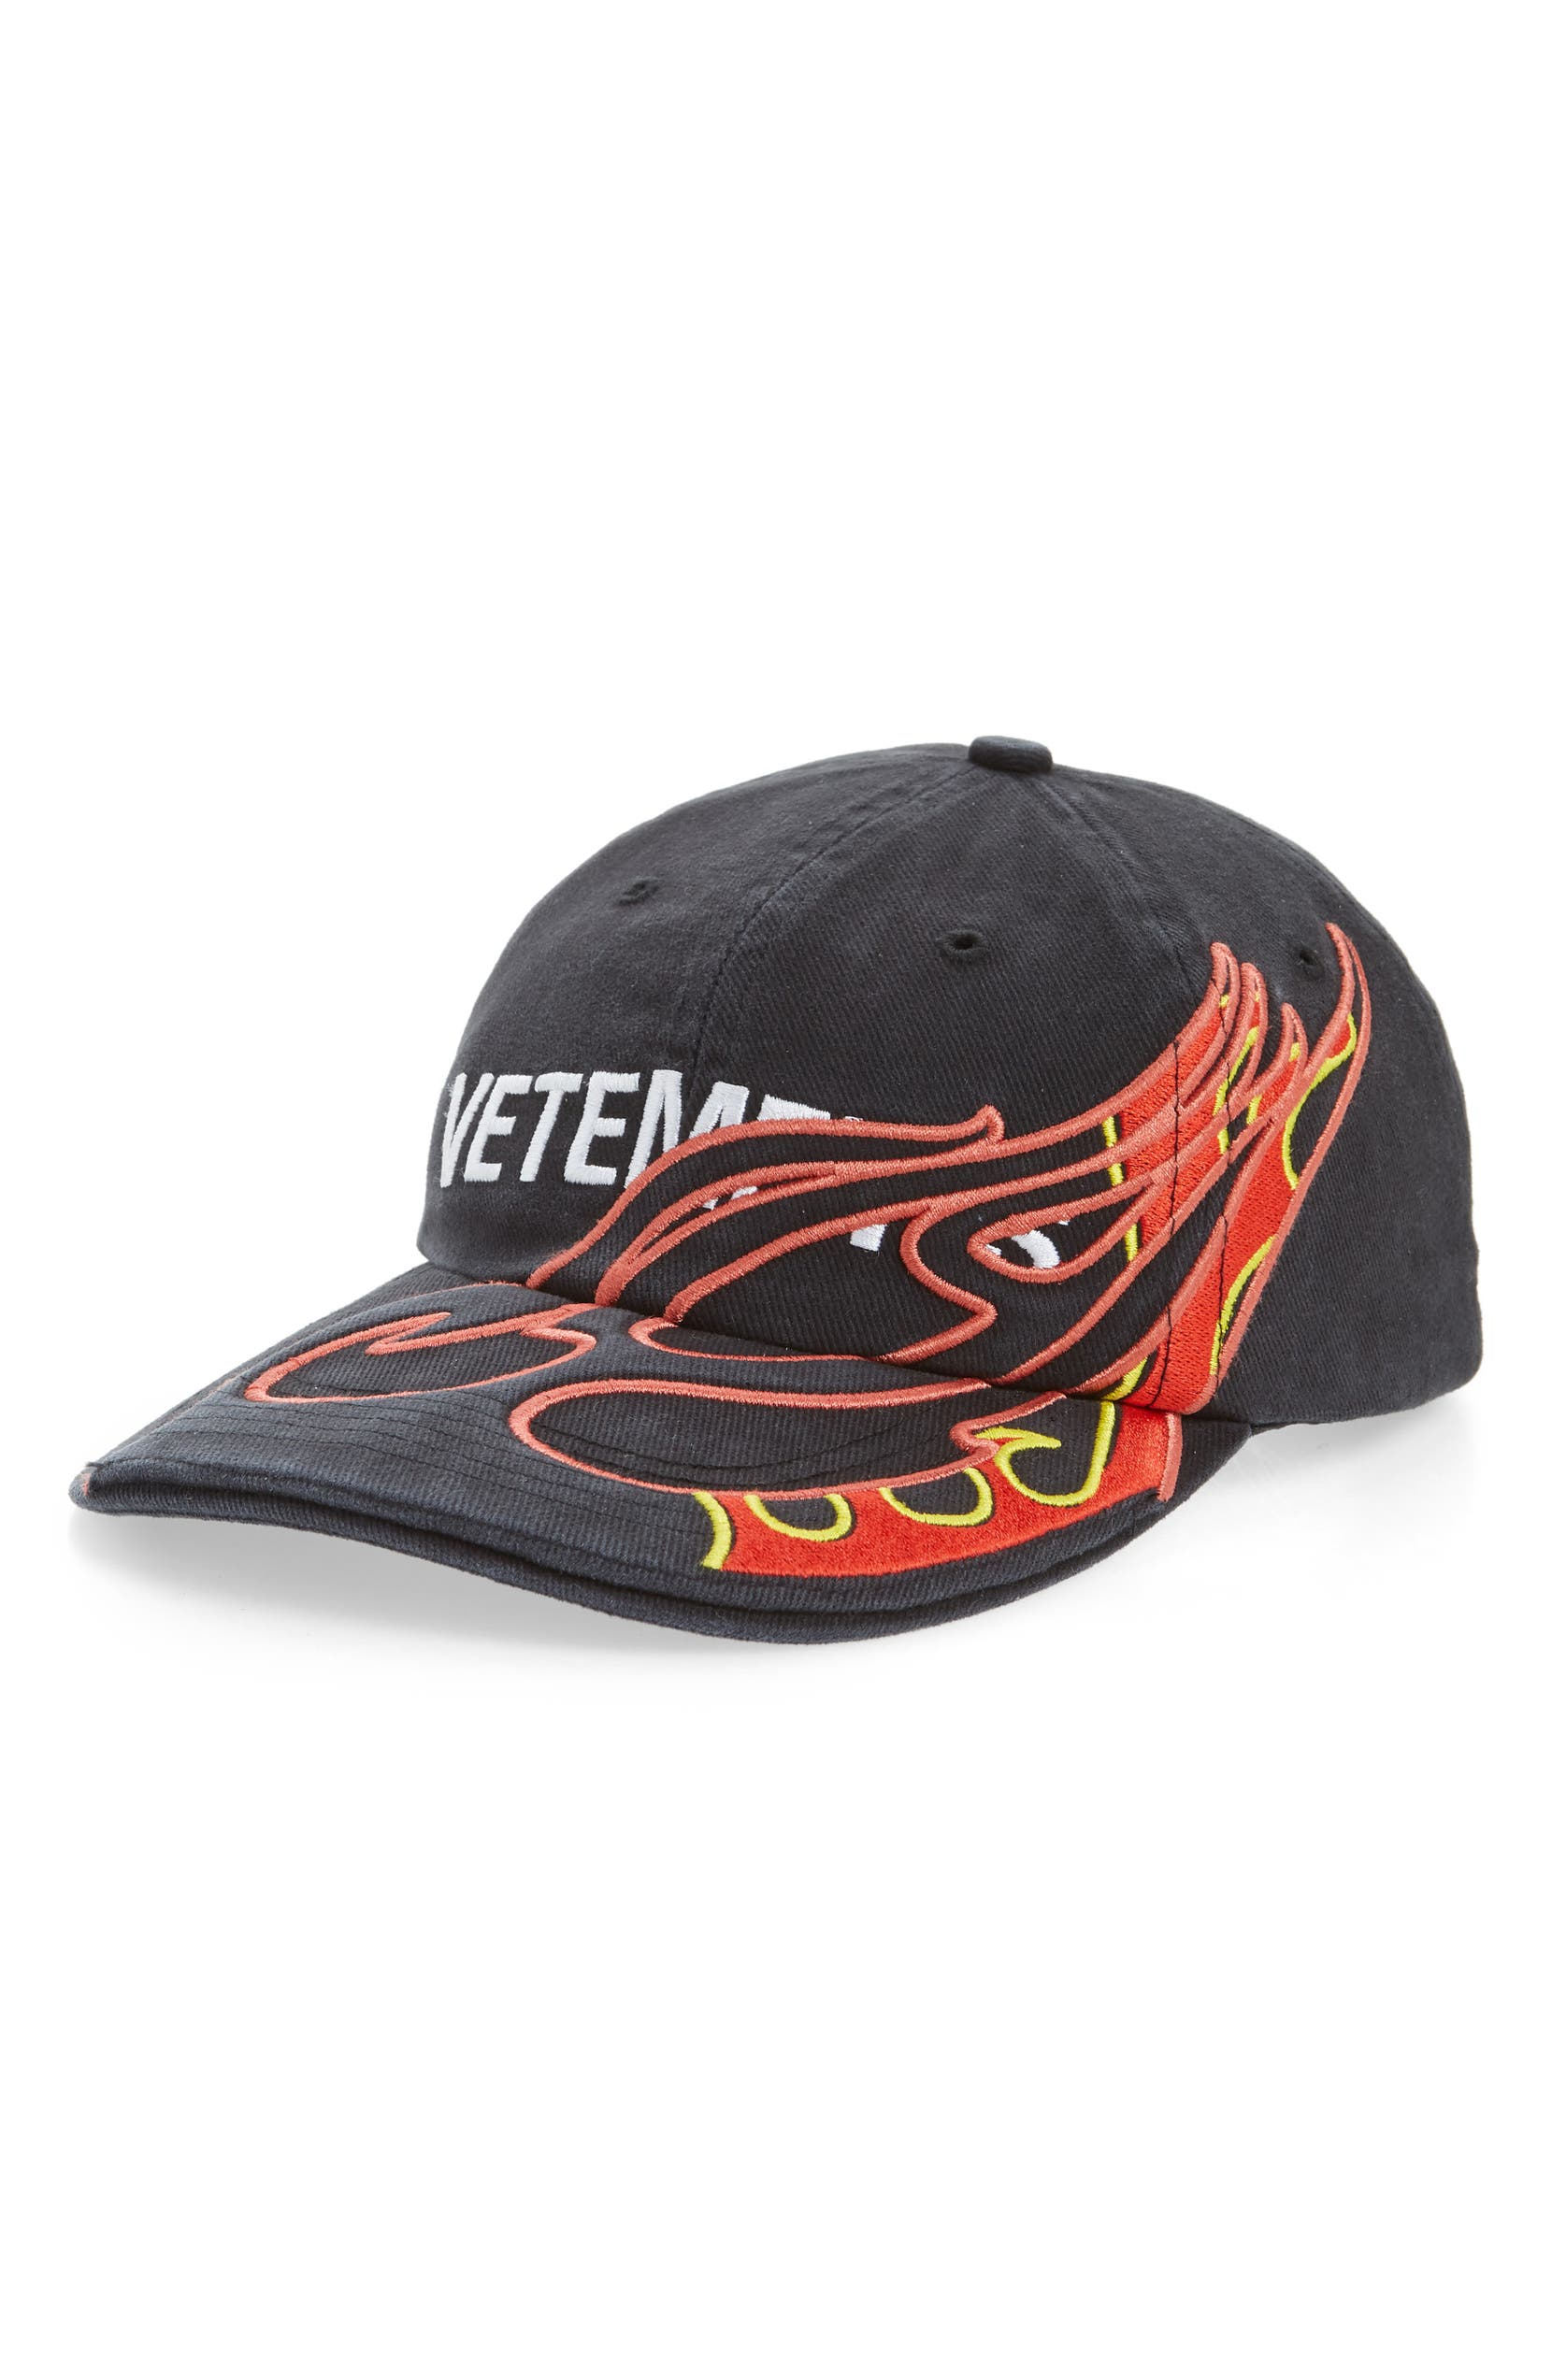 Vetements Fire Logo Baseball Cap  1888511d853